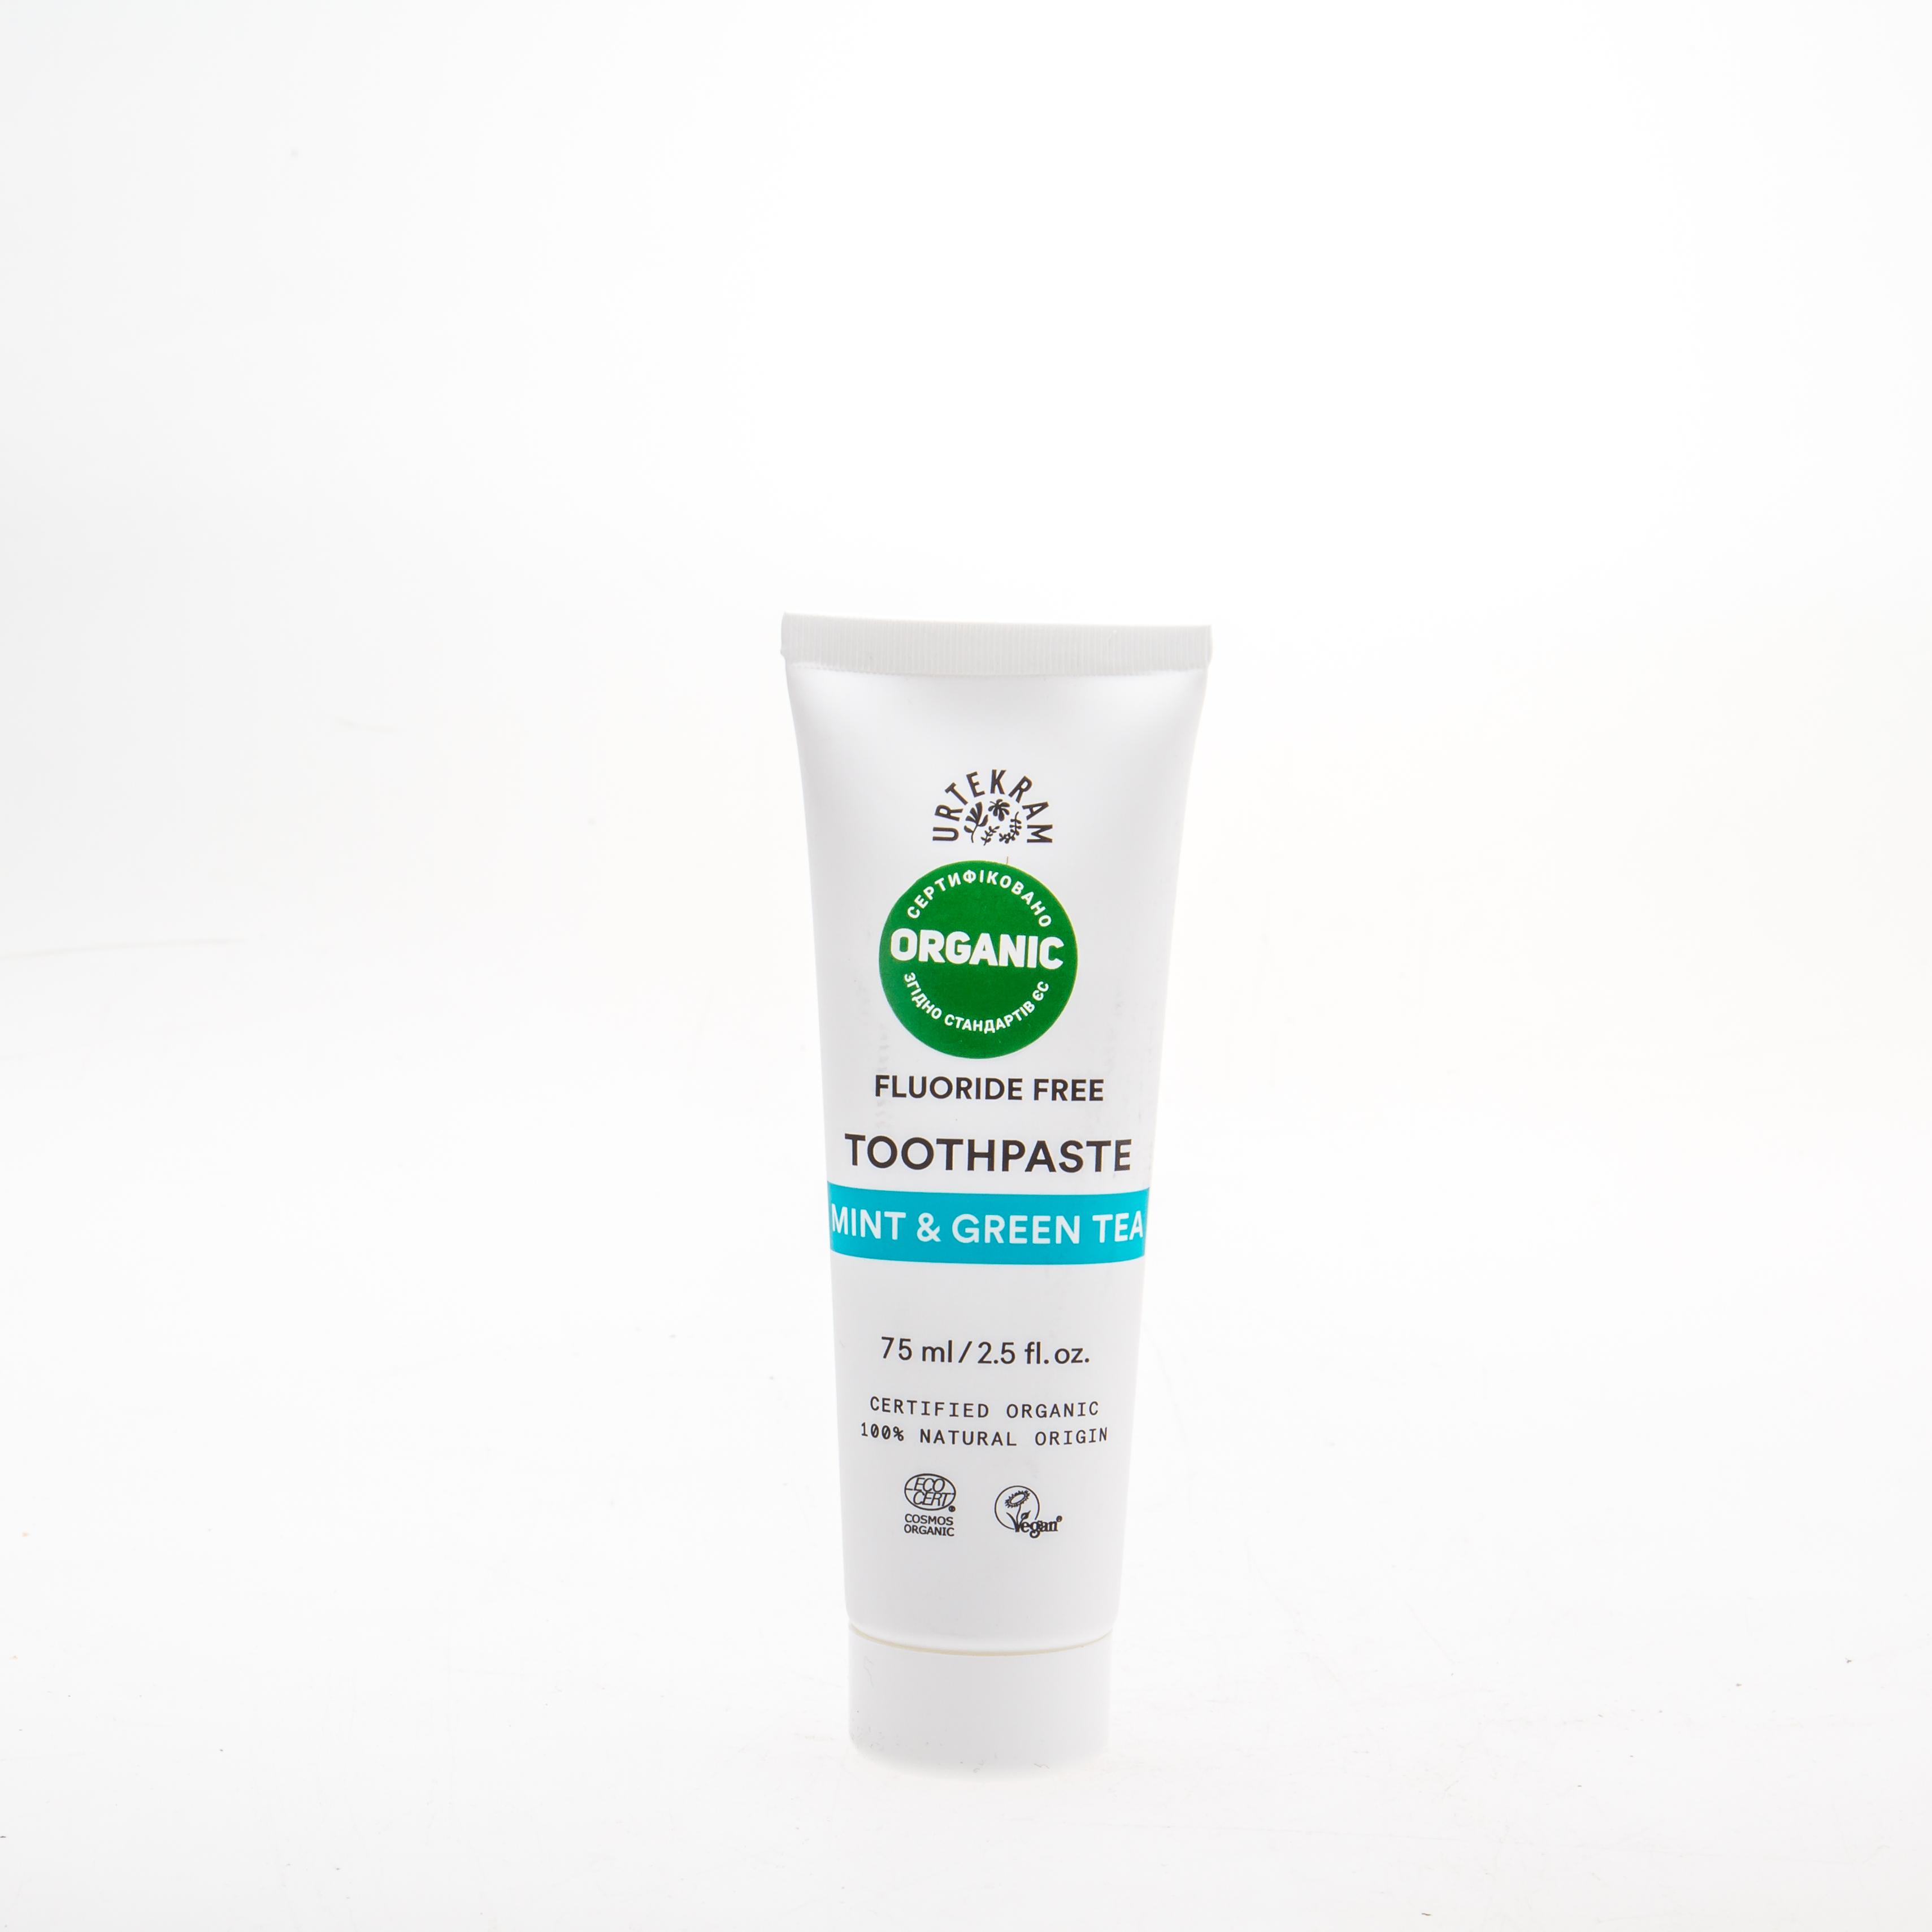 Urtekram Органічна зубна паста Зелений чай/ М'ята, 75 мл - купить в интернет-магазине Юнимед